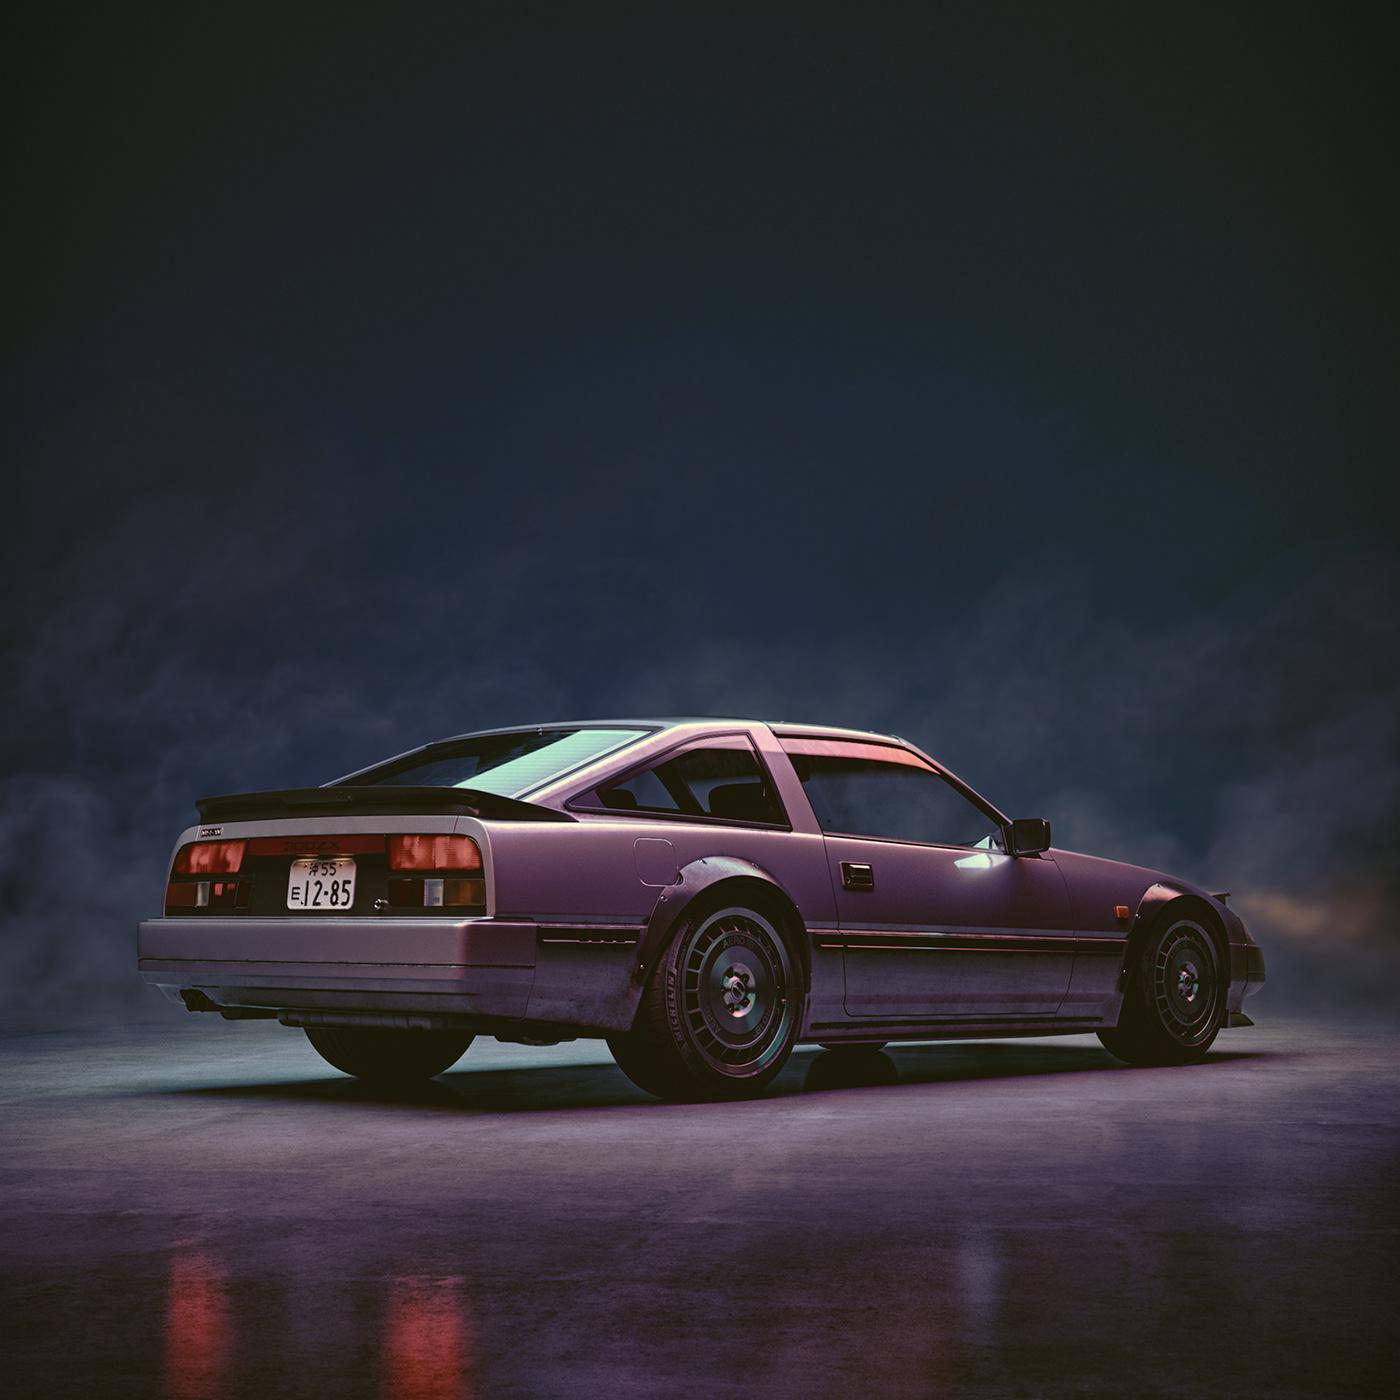 300zx automotive   car FAIRLADY Nissan z31